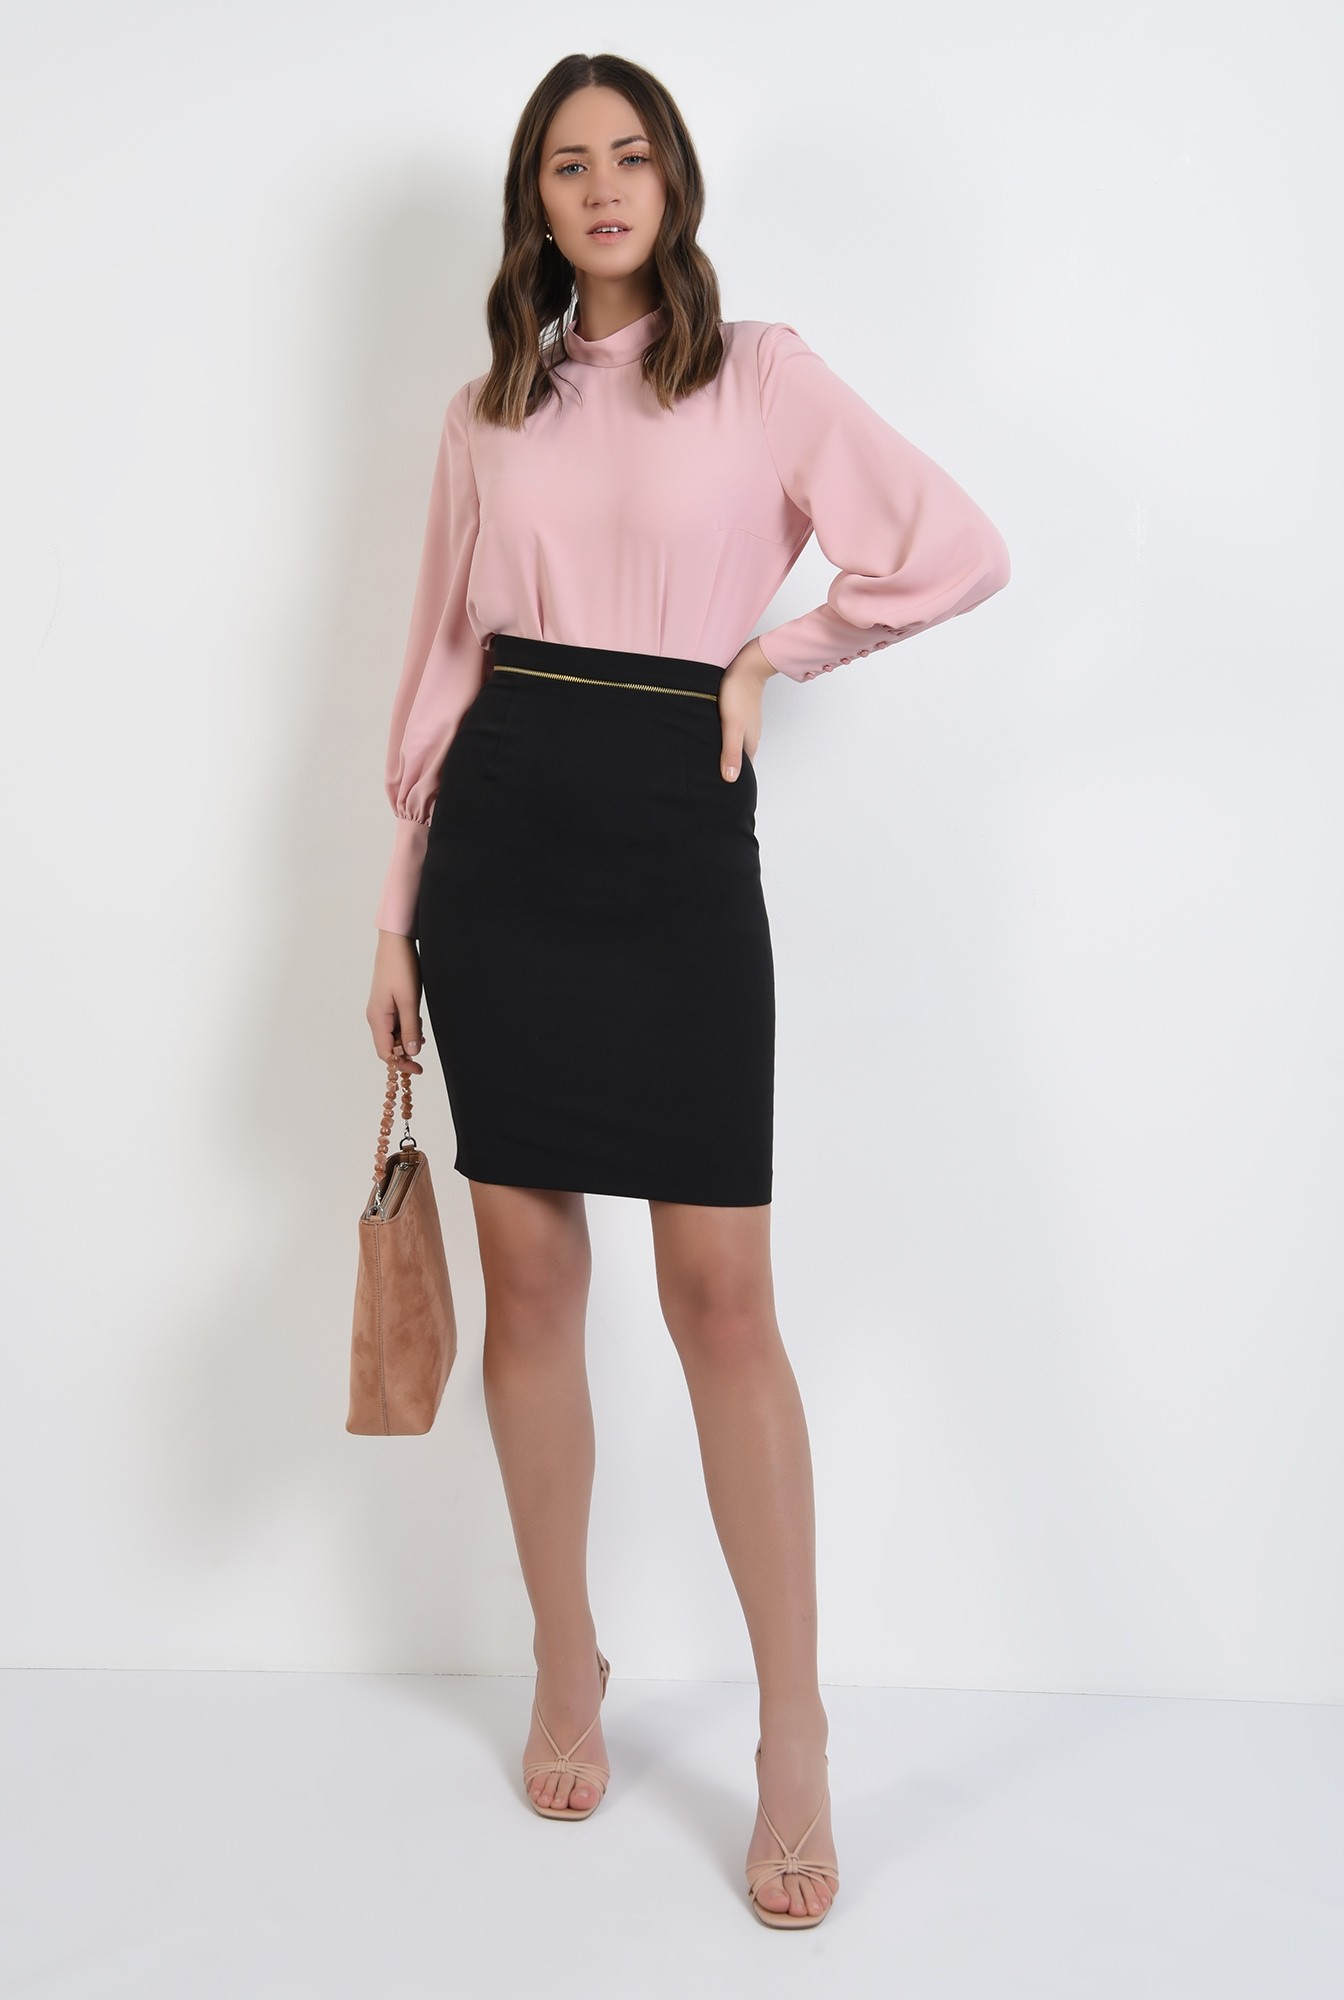 3 -  bluza office, roz, guler perkins, maneci lungi, Poema